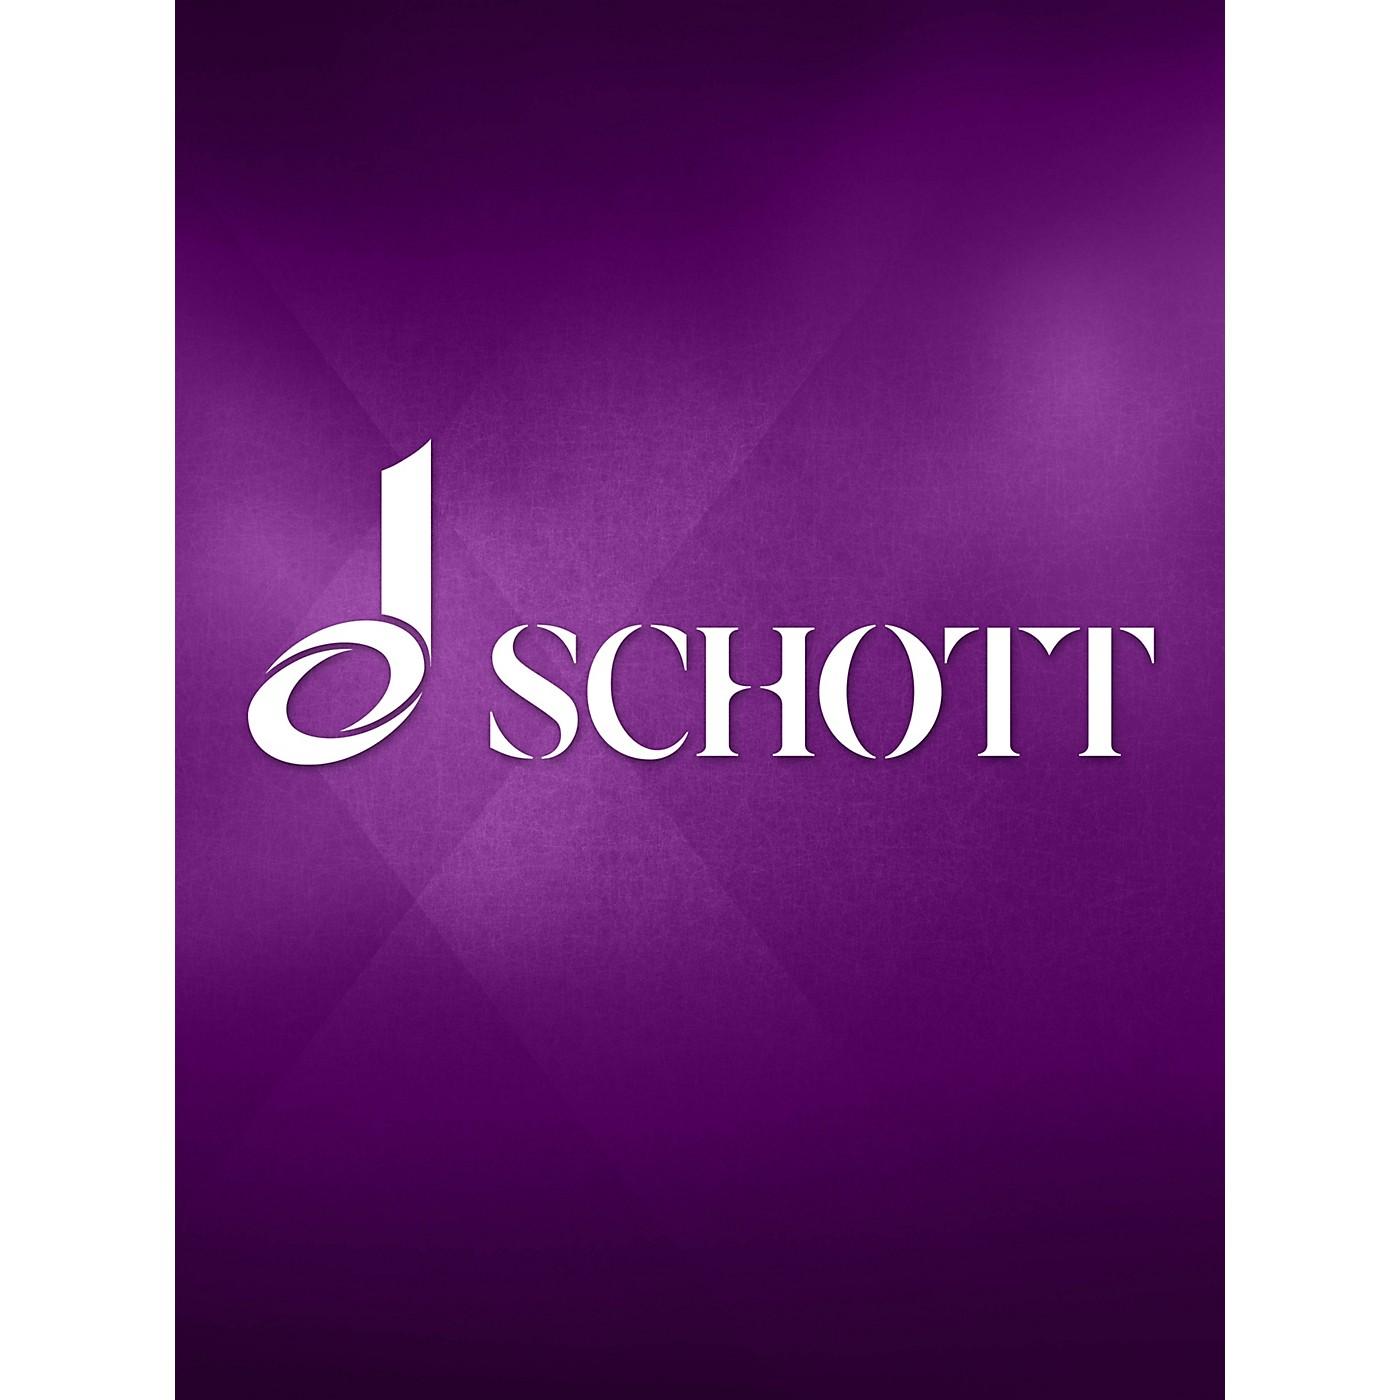 Schott Obertass, Op. 19, No. 1 (1860) (Violin and Piano) Schott Series thumbnail